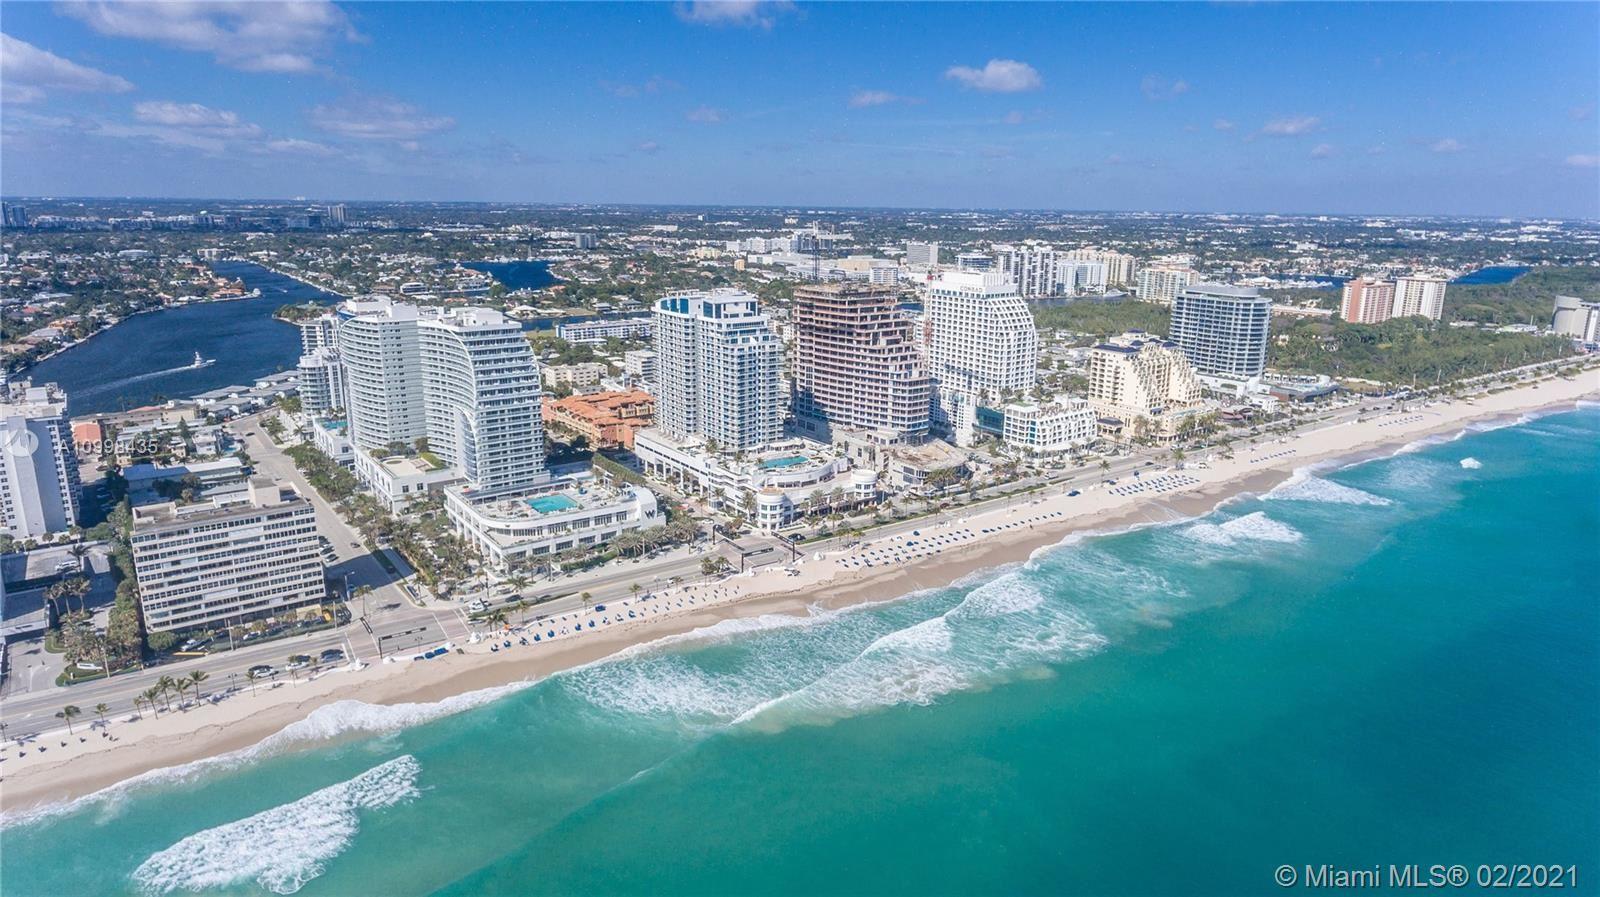 505 N Fort Lauderdale Beach Blvd #1203, Fort Lauderdale, FL 33304 - #: A10998435